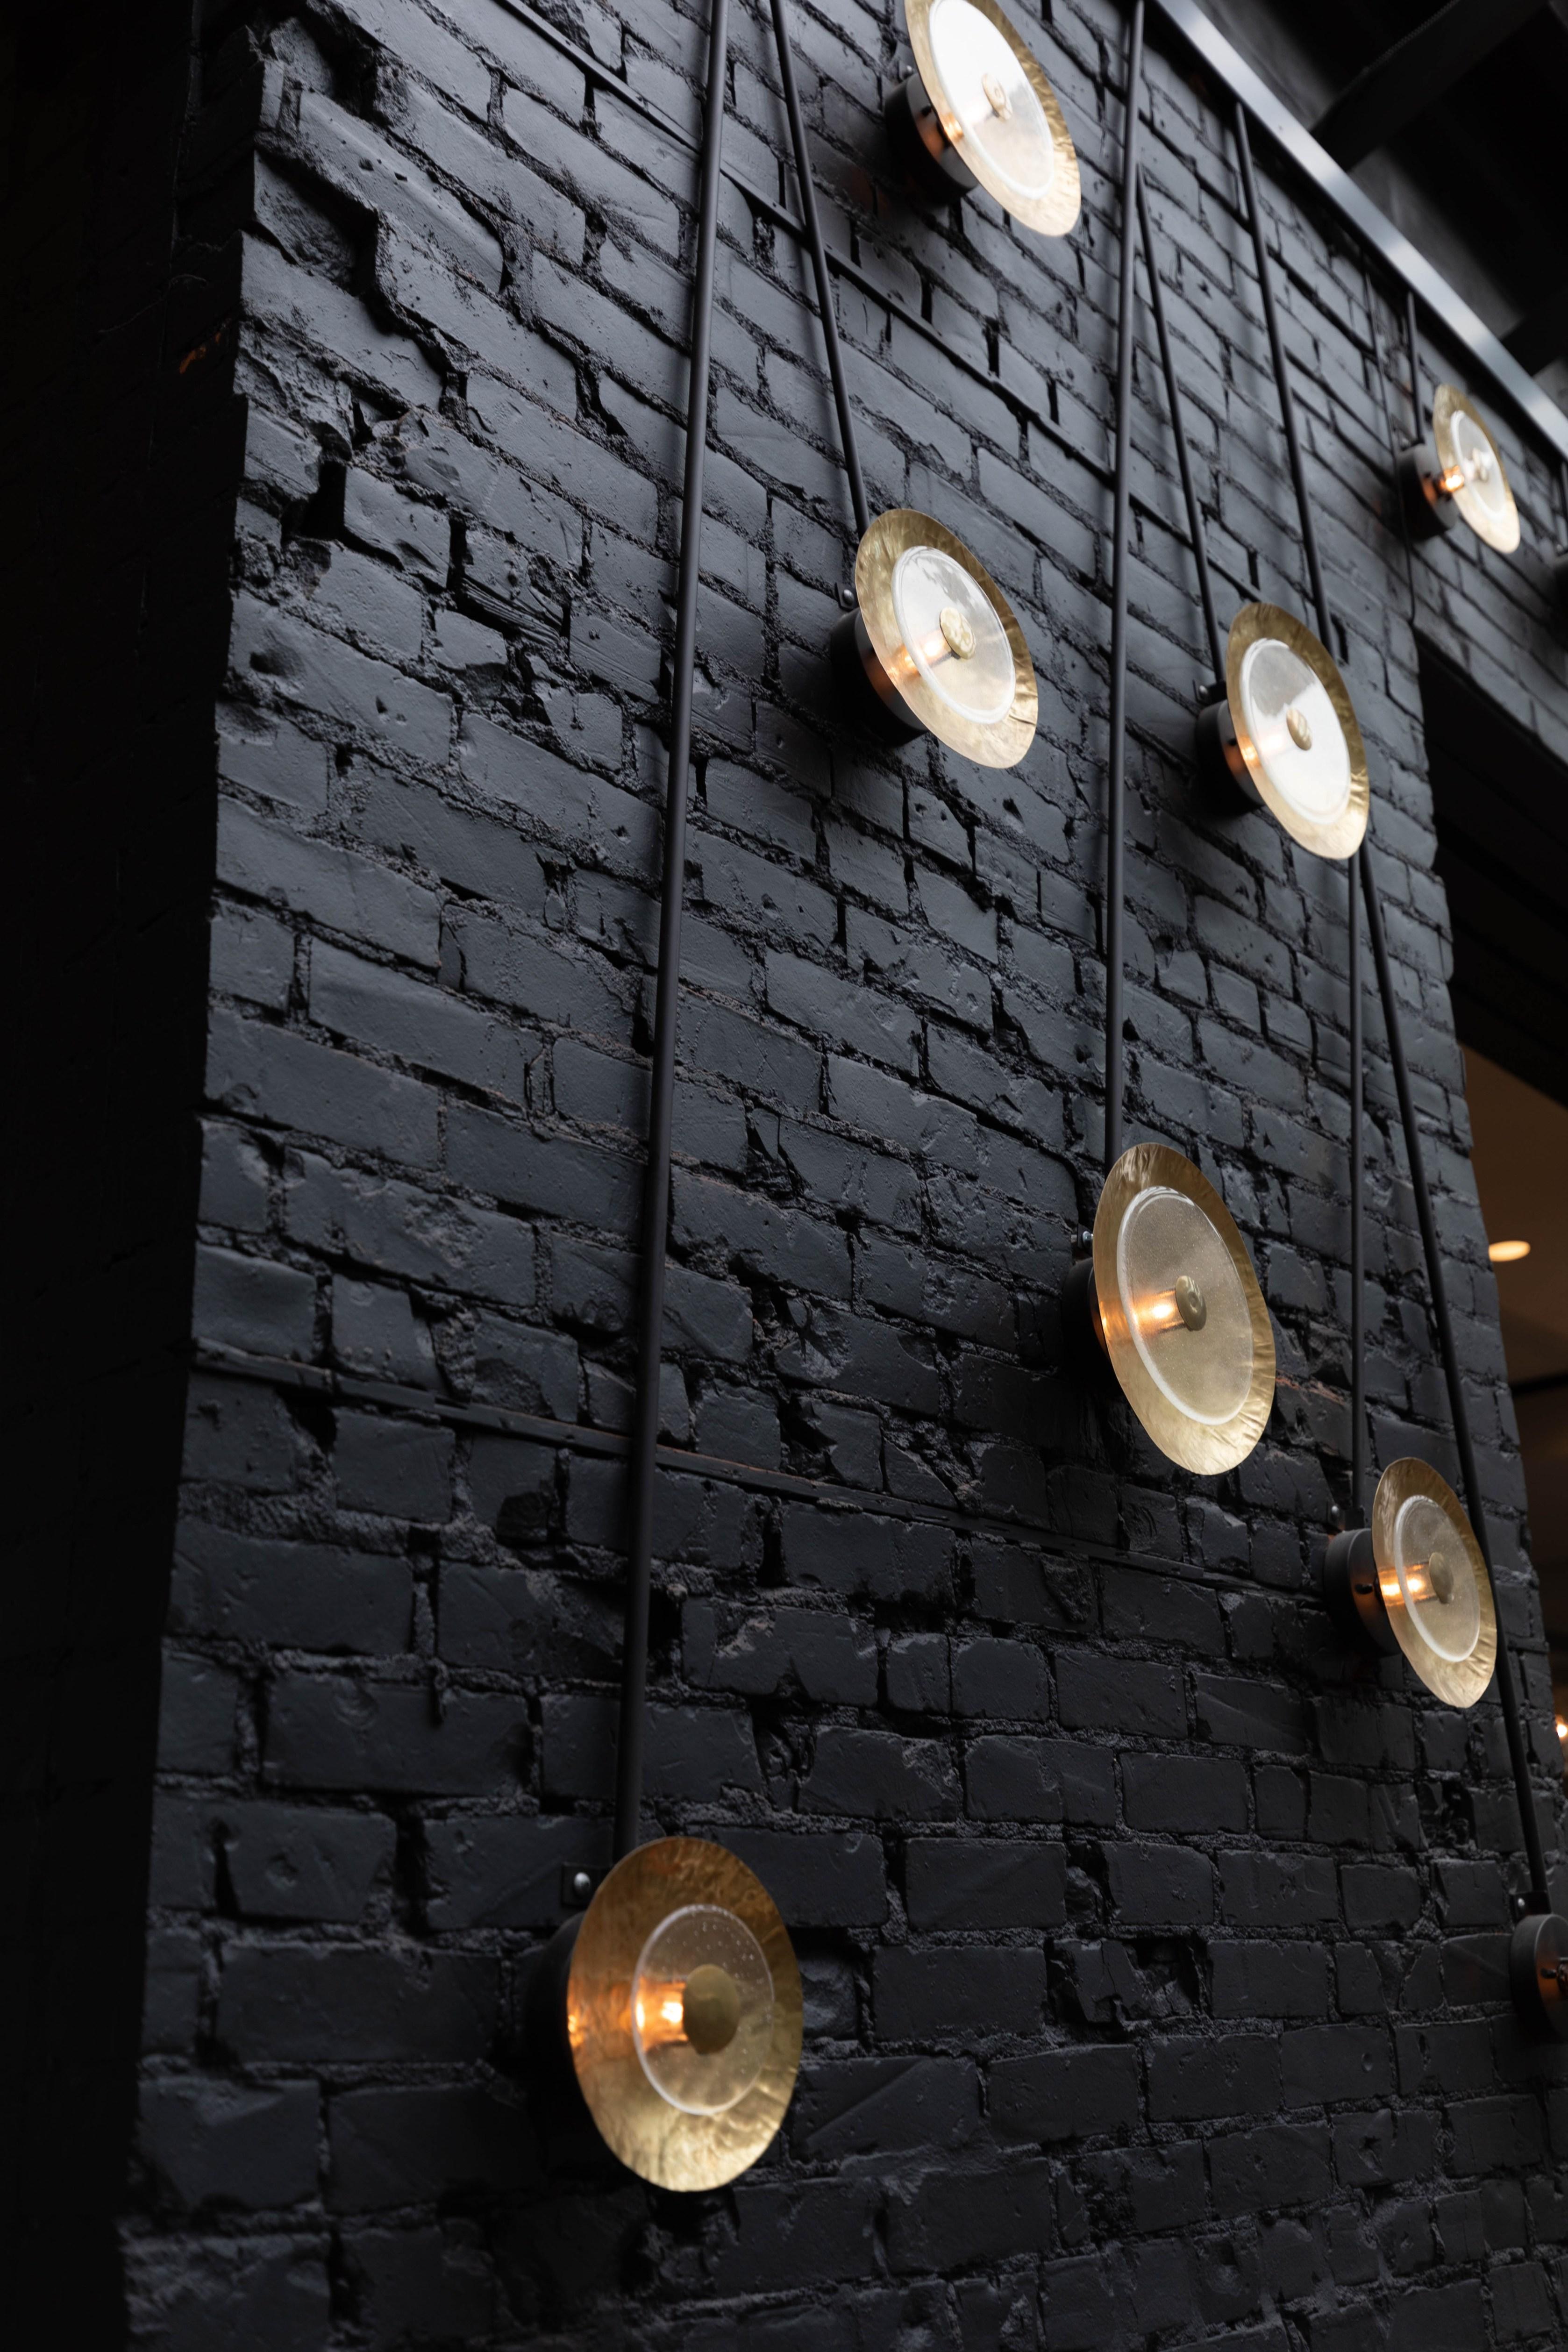 Luxury Restaurants of the World: Coppin's Restaurant in Covington, KY by Annie Fairfax